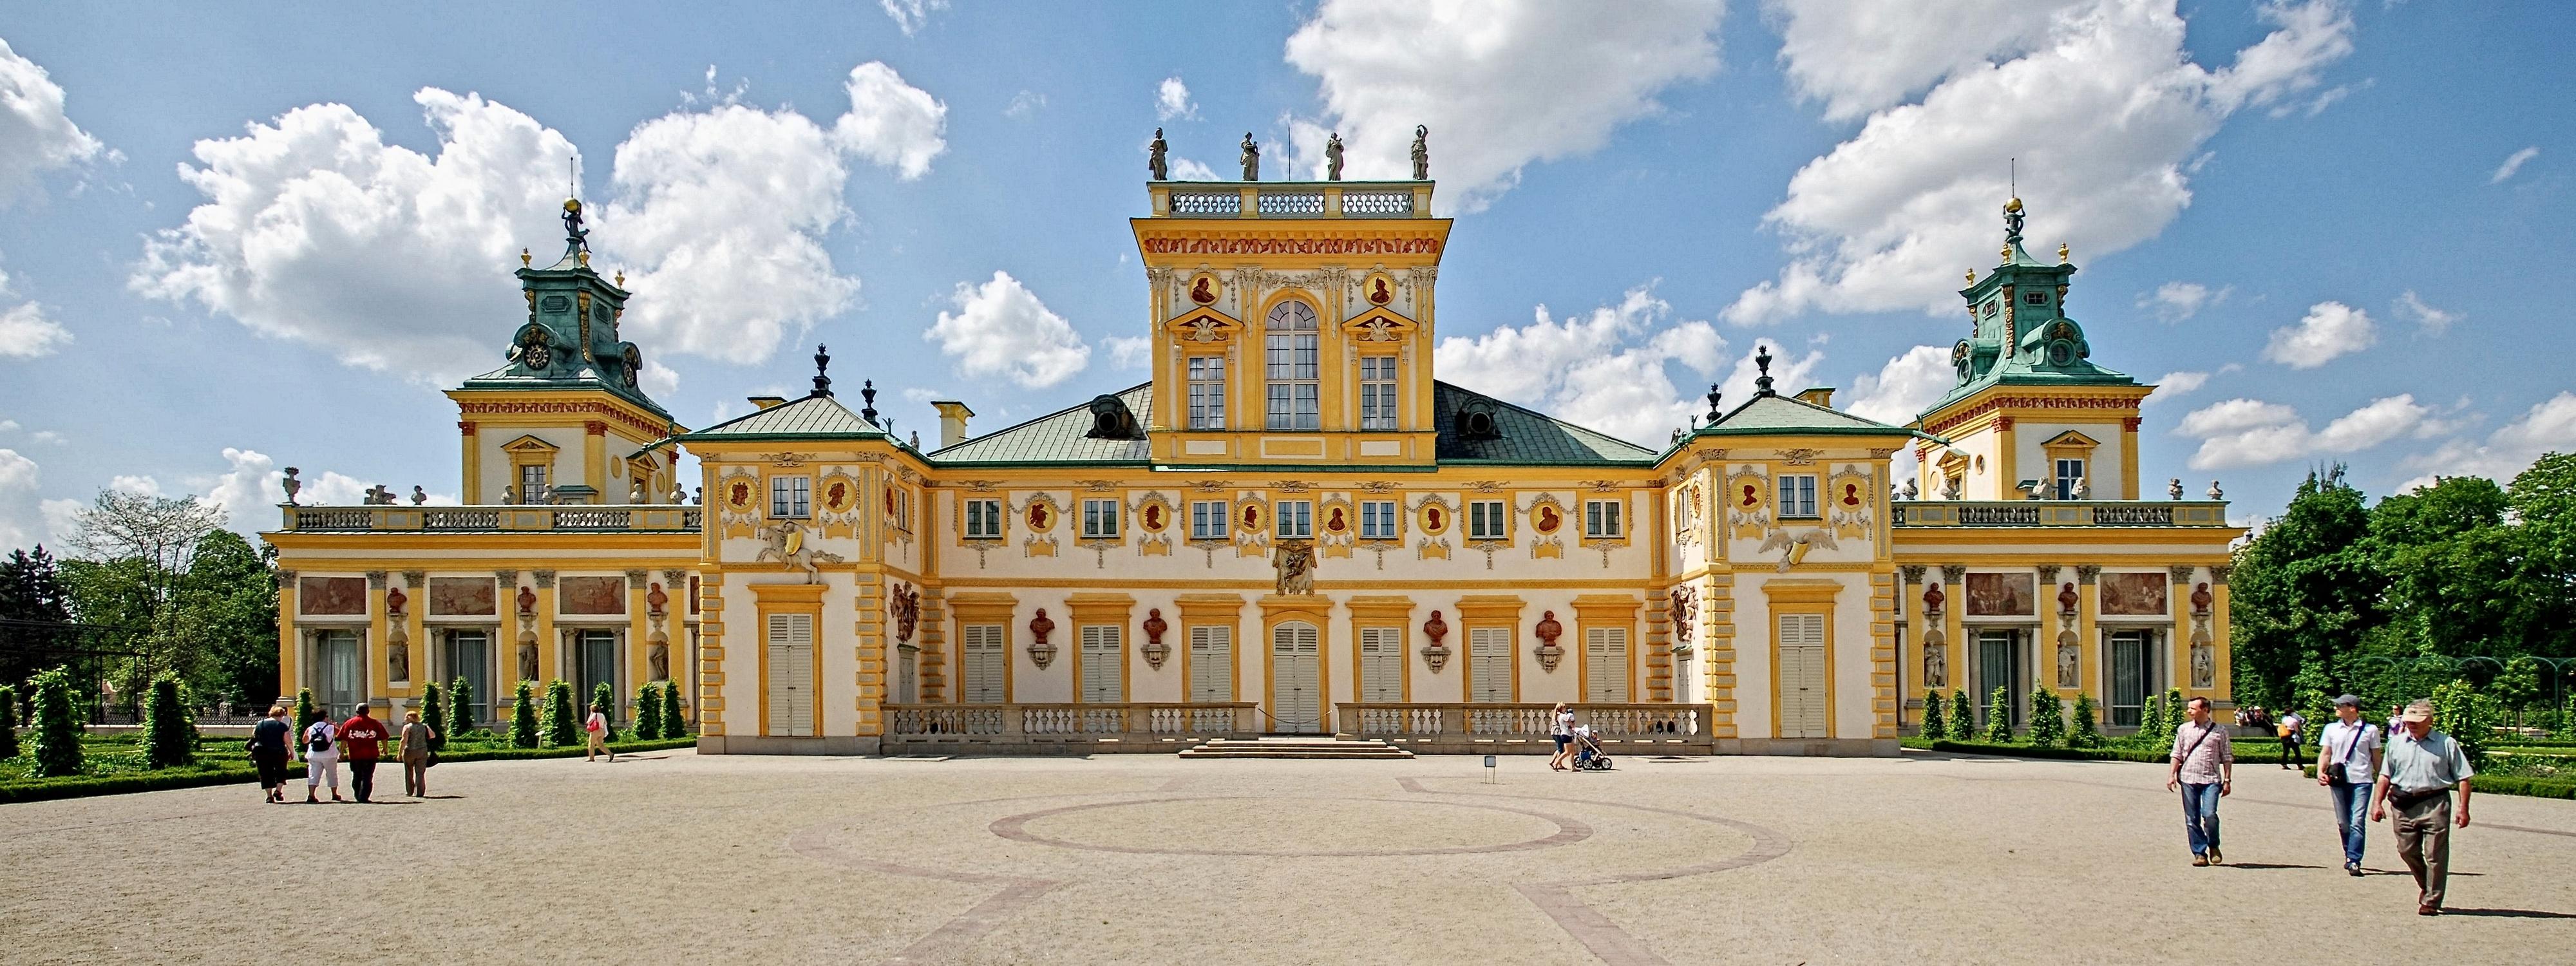 Wilanów-Palast